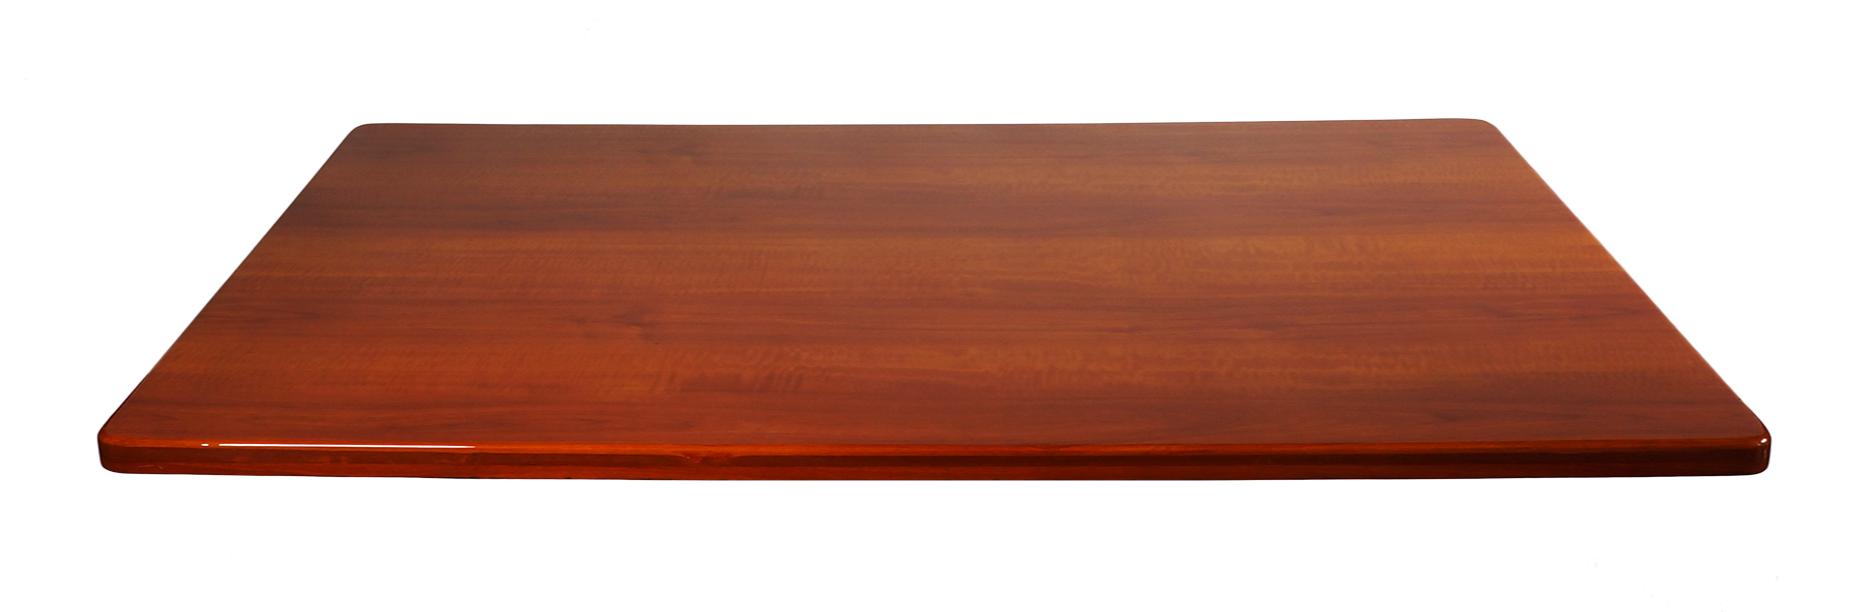 Merveilleux BFM Resin Table Top 30x60 Cherry